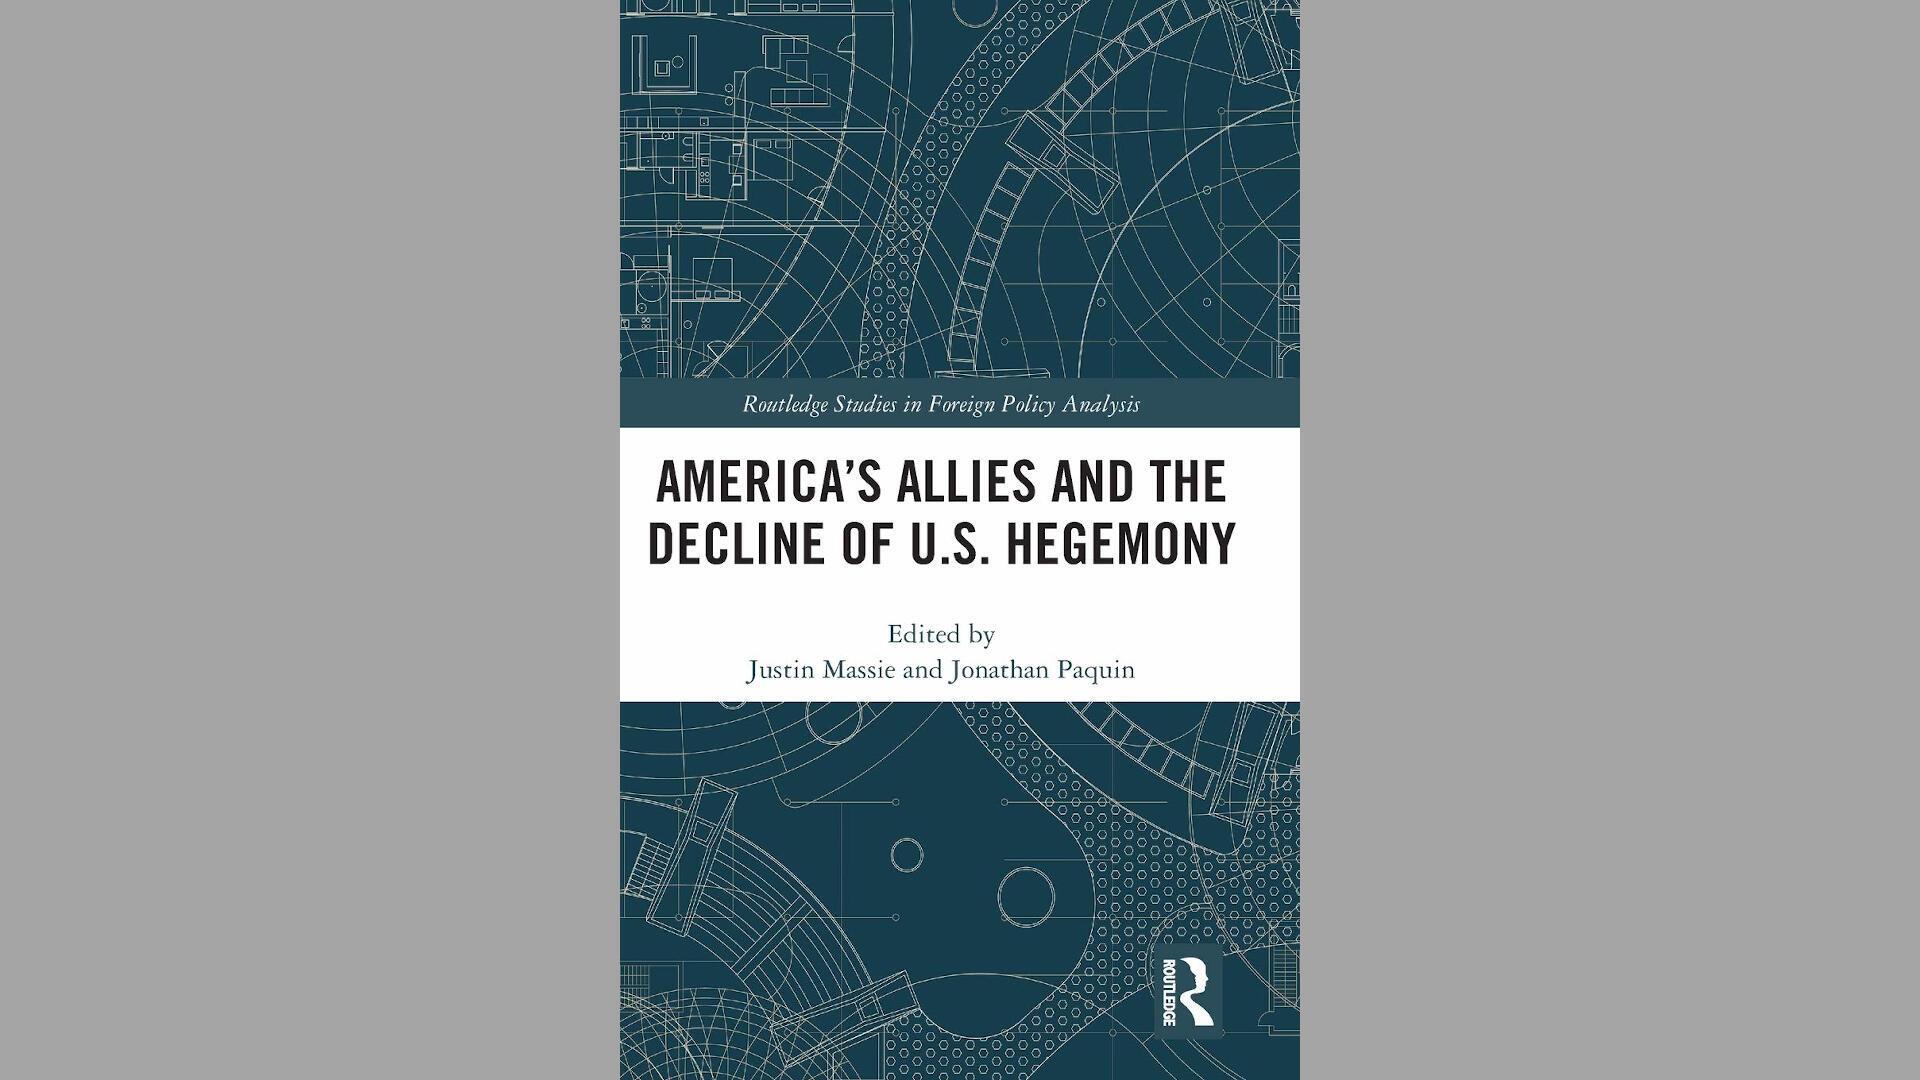 Couverture du livre «America's allies and the decline of the U.S. hegemony» par Jonathan Paquin et Justin Massie.